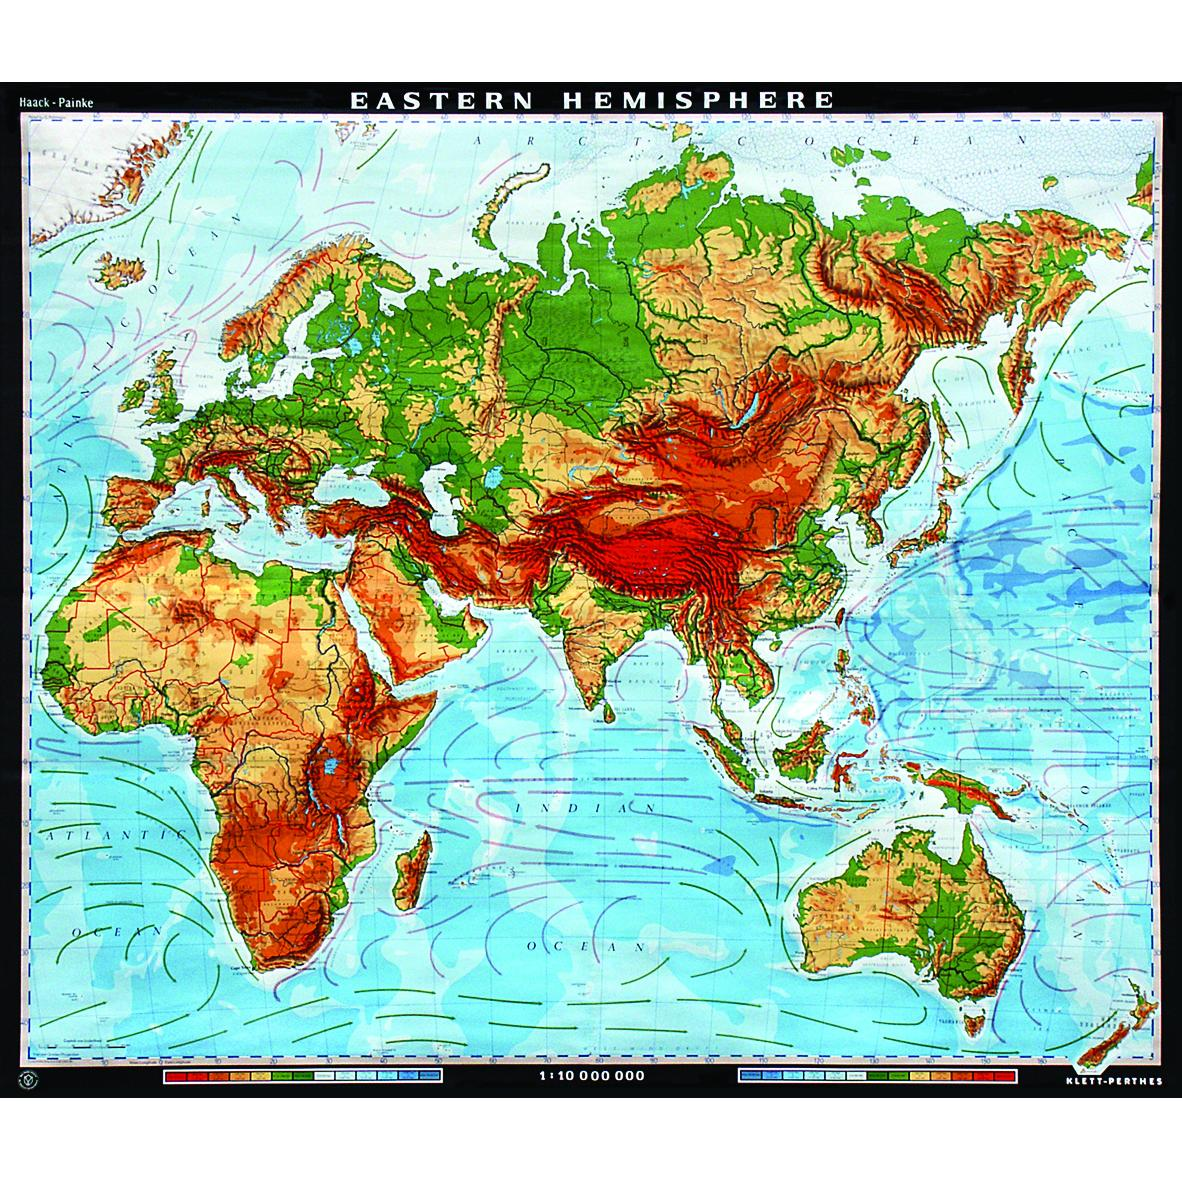 The Eastern Hemisphere Physical Map